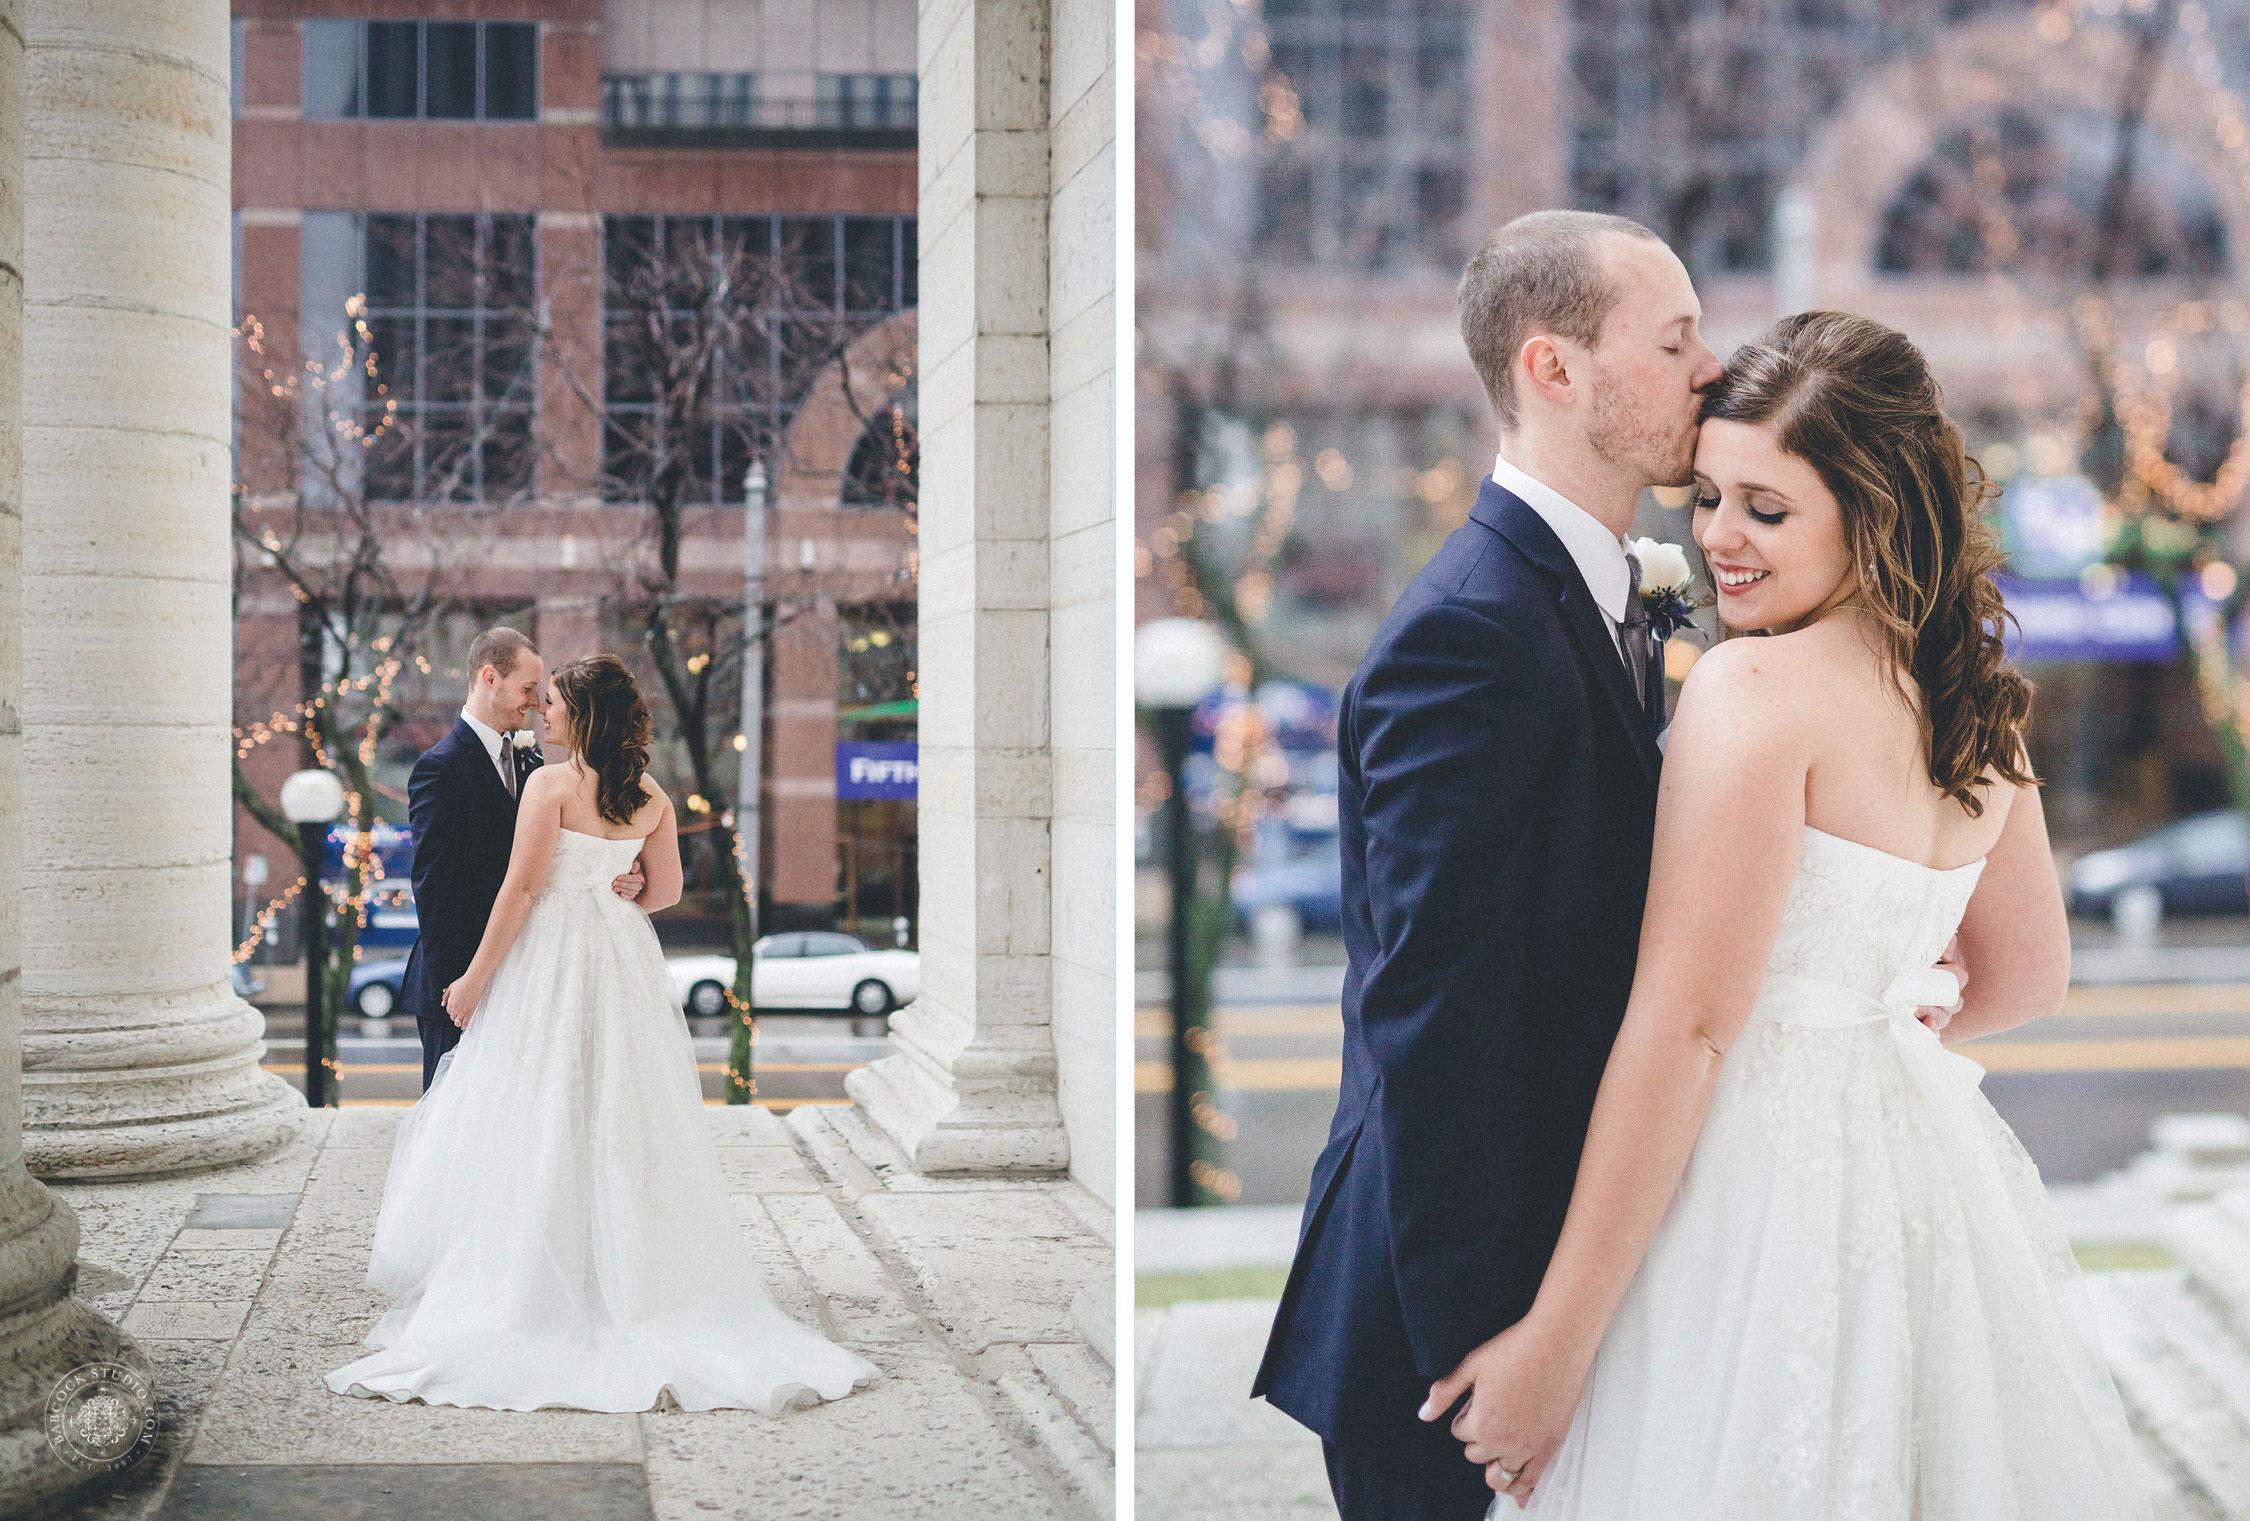 erica-nick-wedding-photographer-dayton-ohio-8.jpg